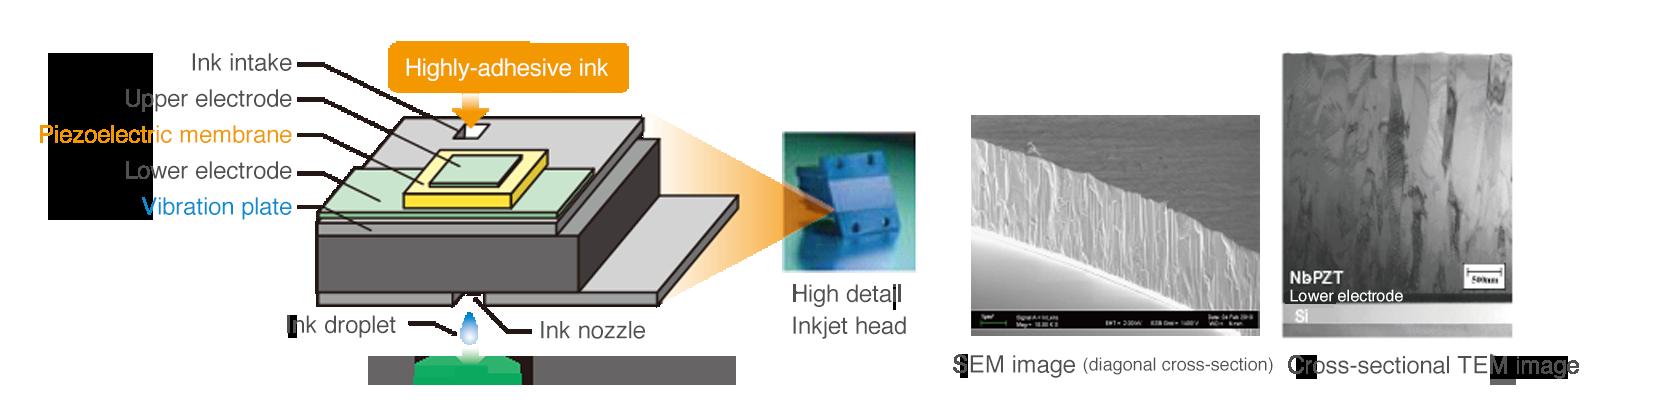 [image] Applied to inkjet heads